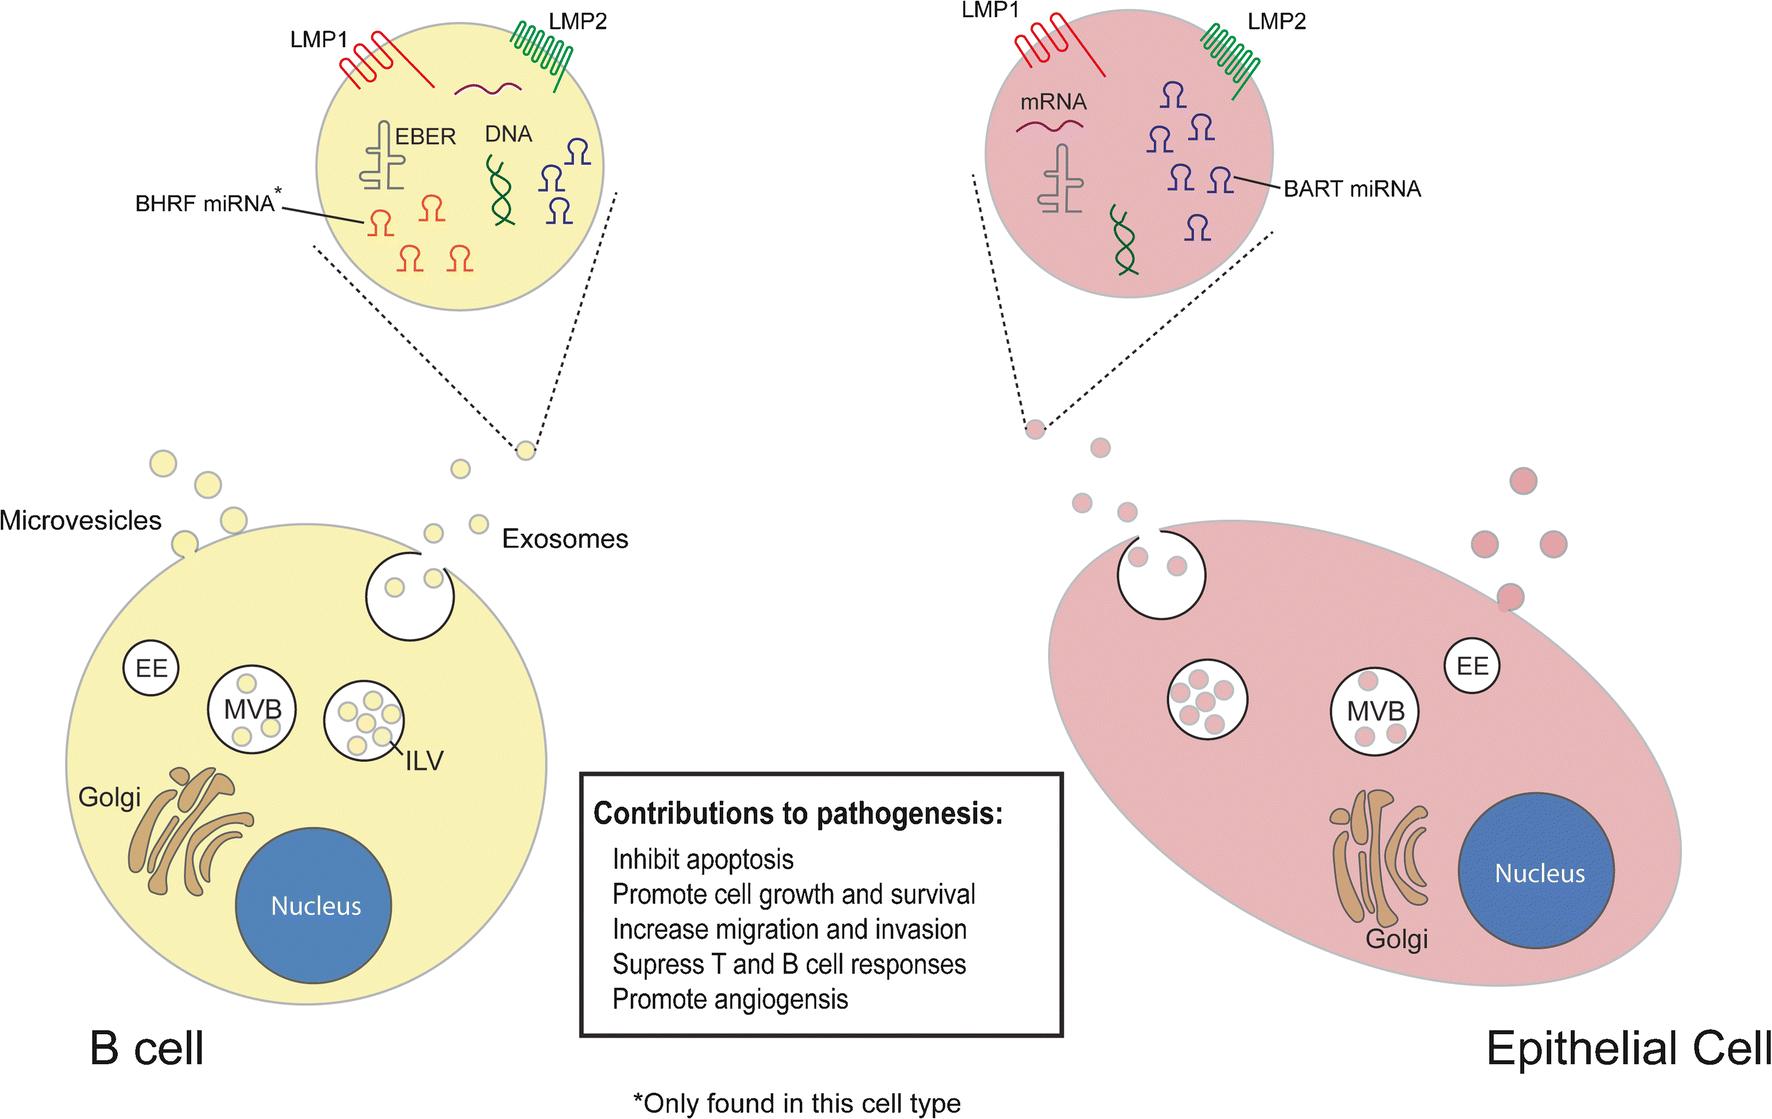 Extracellular Vesicles in Epstein-Barr Virus Pathogenesis